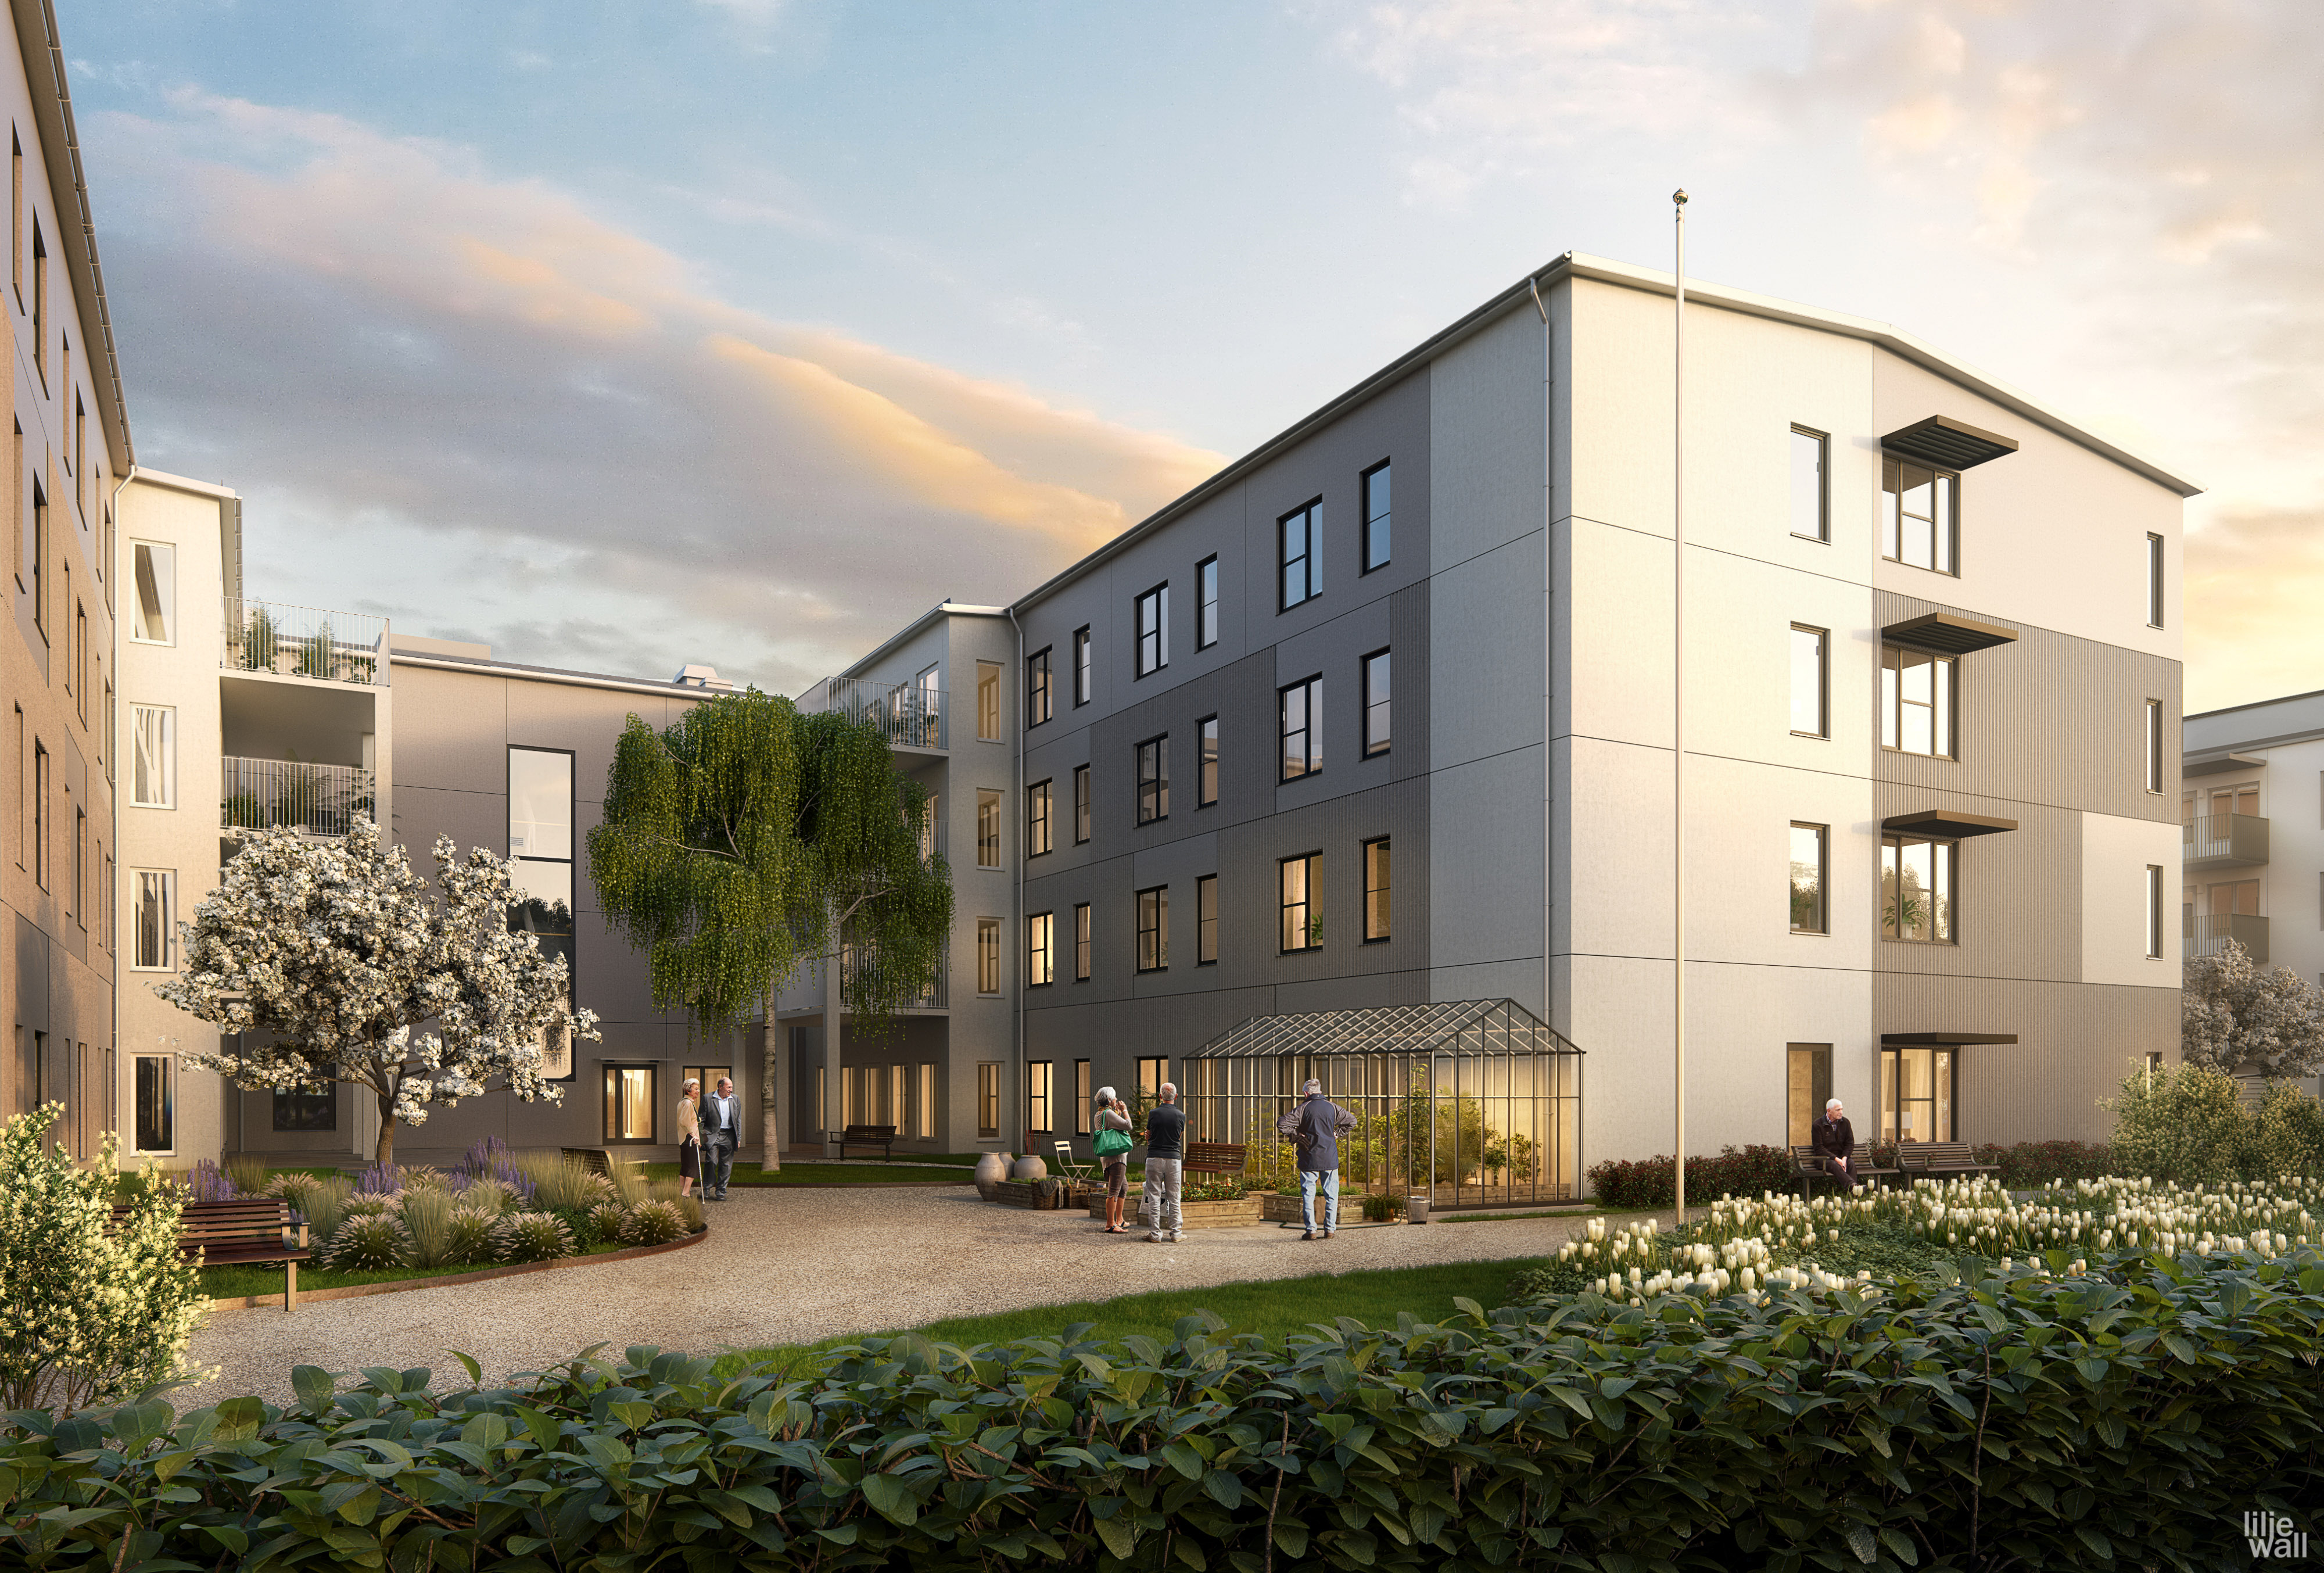 Skanska S Retirement Home And Rental Apartments In Älvängen Sweden For About Sek 310 M